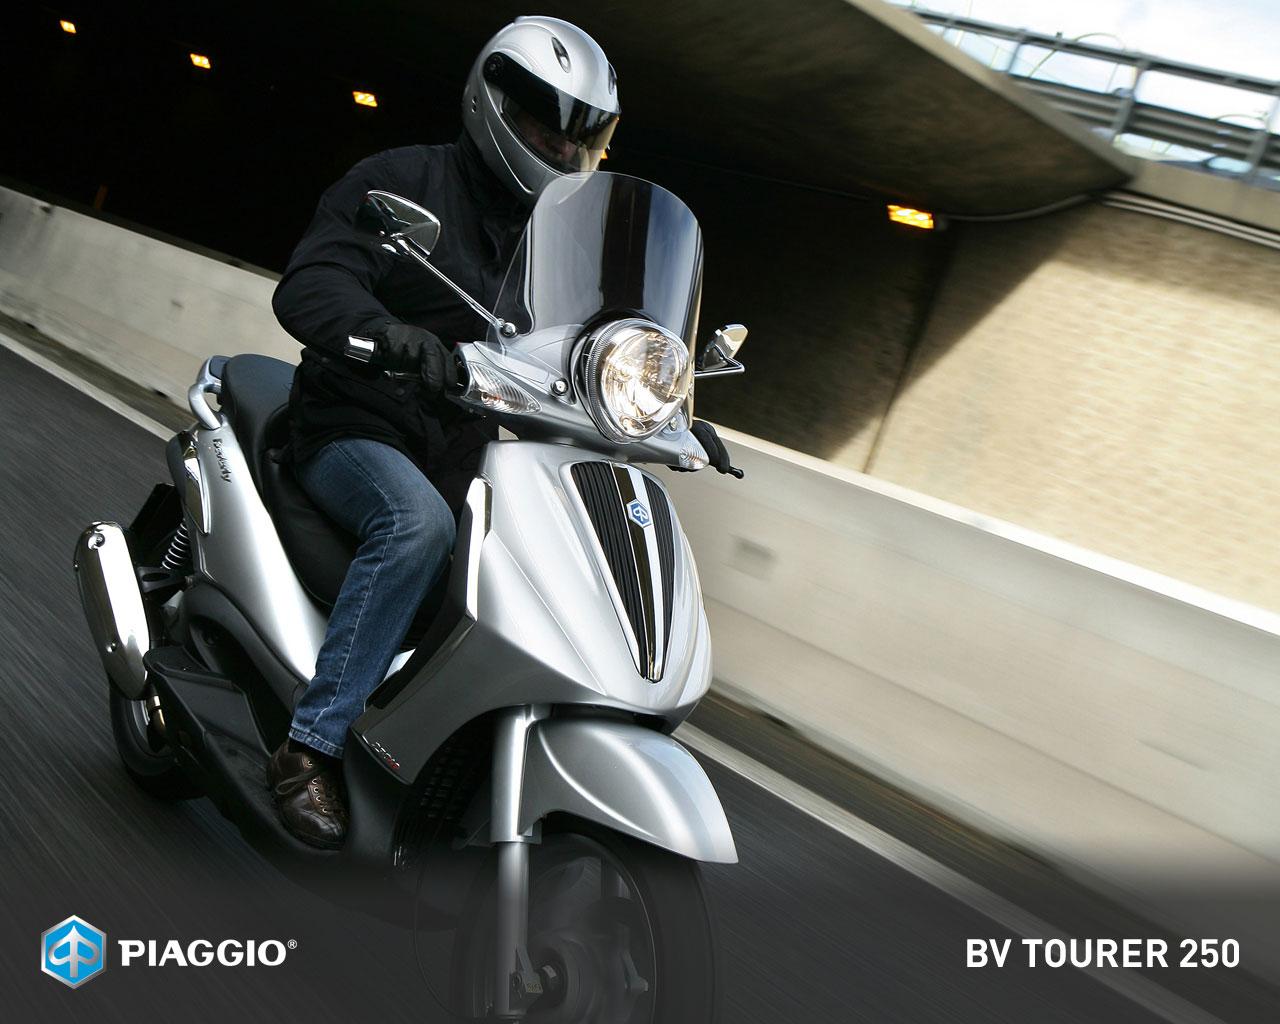 piaggio bv tourer 250 specs - 2008, 2009 - autoevolution